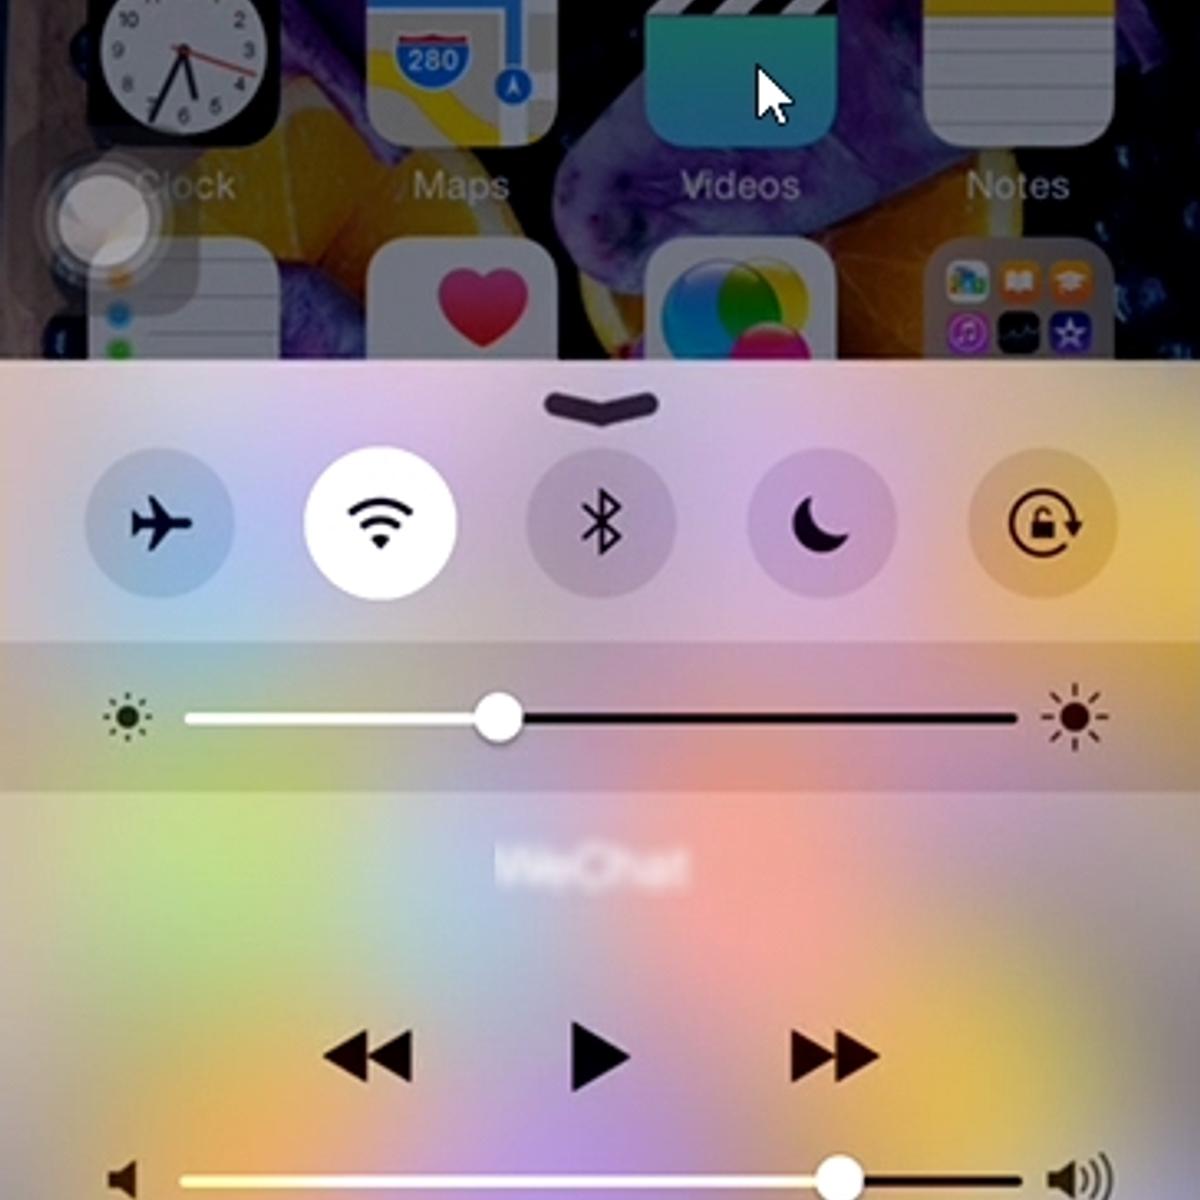 Apowersoft iPhone/iPad Recorder Alternatives and Similar